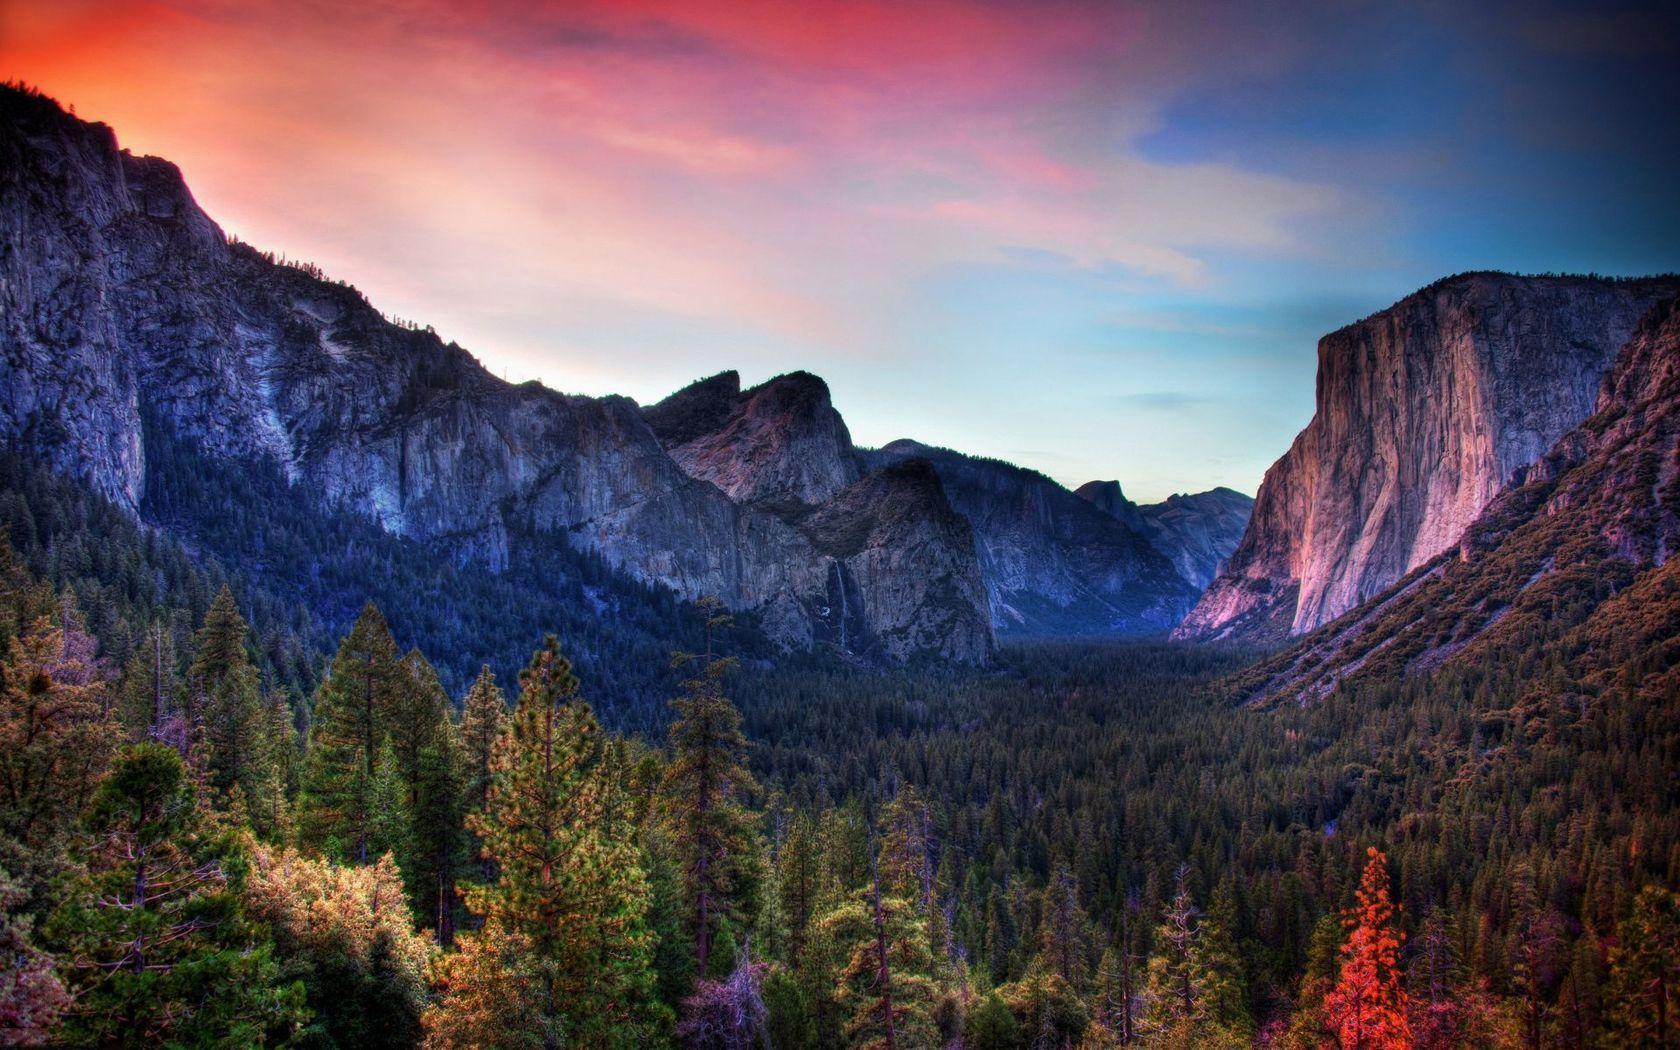 Yosemite Wallpaper, Nature / Forest: Yosemite, k wallpapers 1900×1200 Yosemite Wallpapers (41 ...